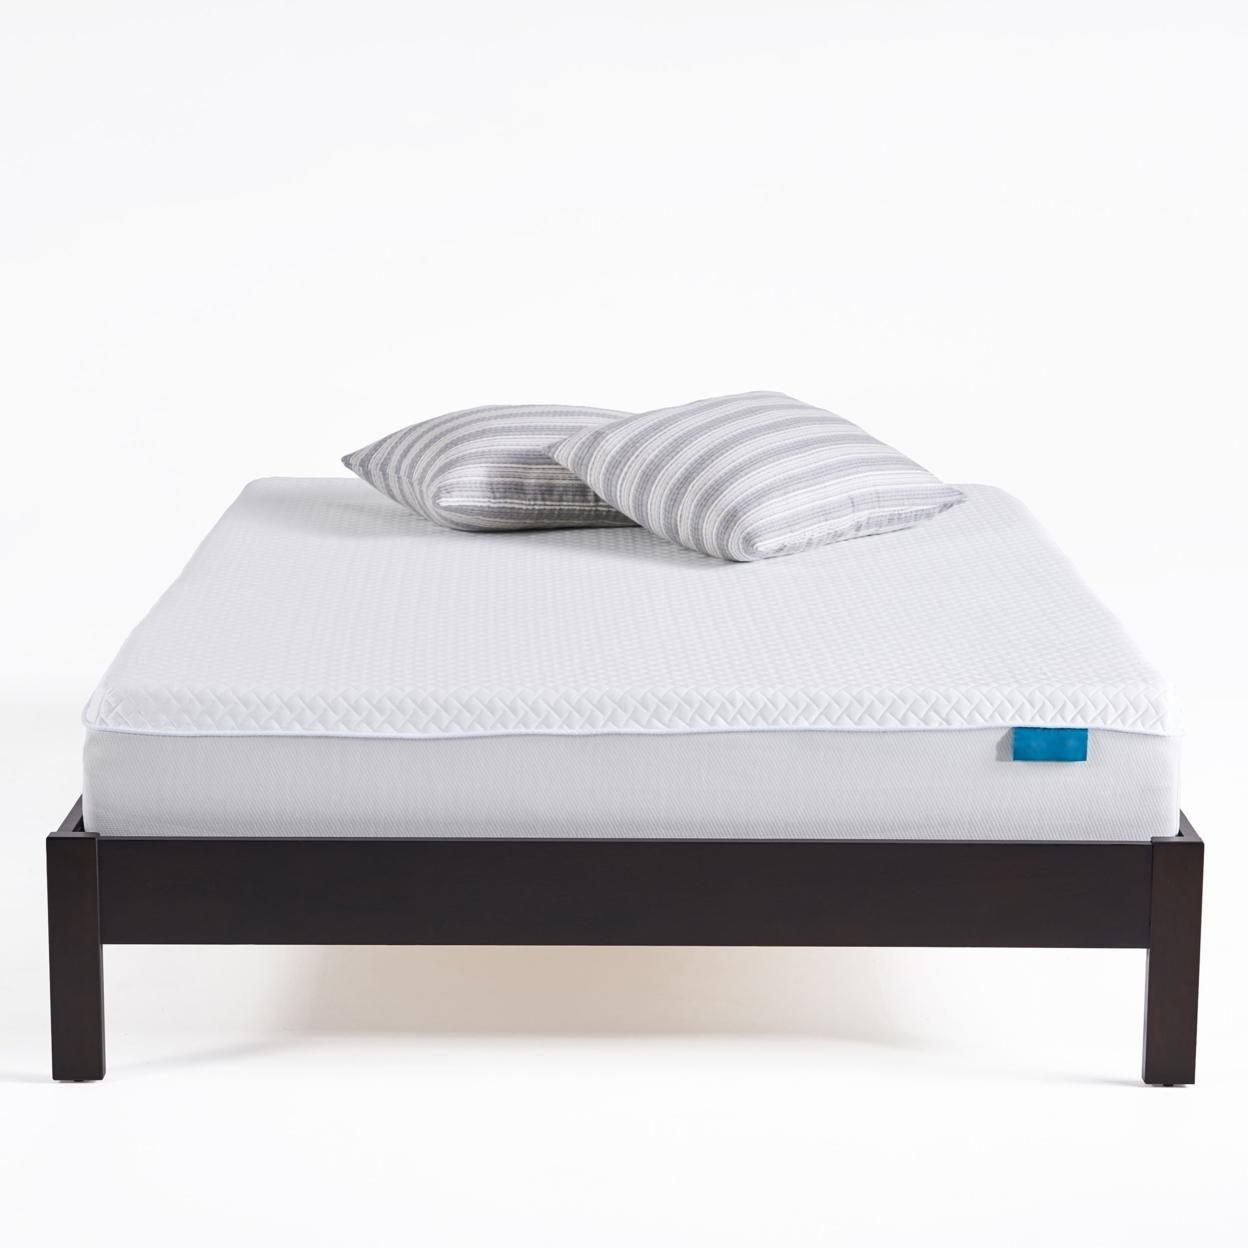 "Barchetta 10"" Medium Soft Cool to Touch Mattress, White and Gray"